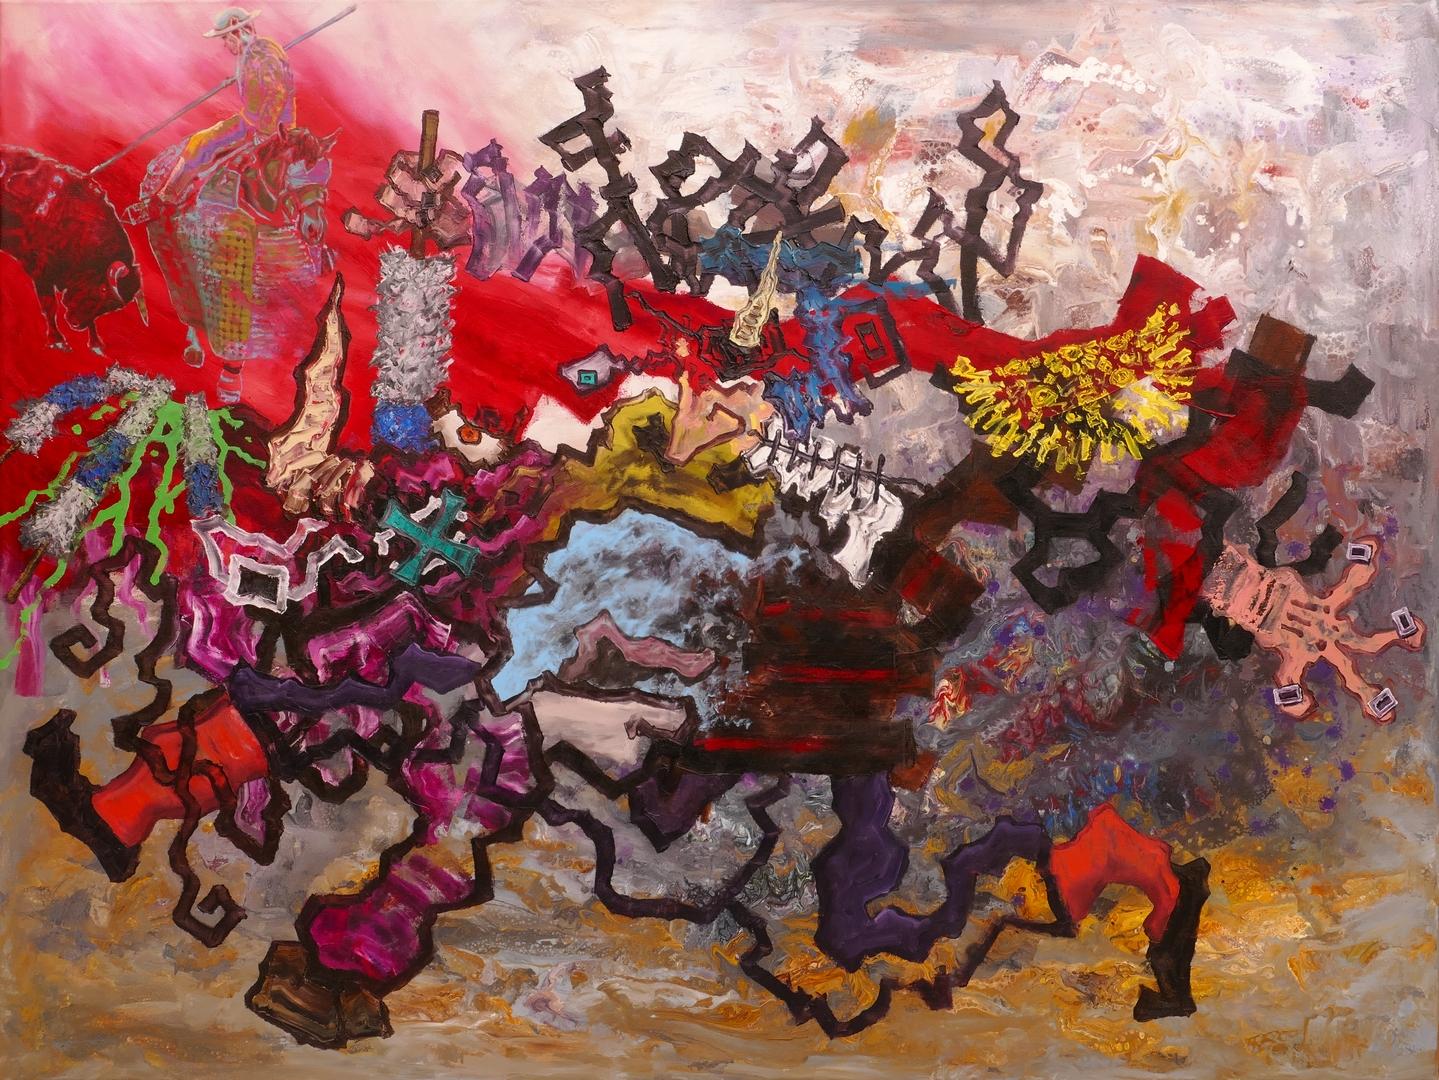 B, Das rote Bild, 120x160cm, Öl, Acryl auf Leinwand, 2020